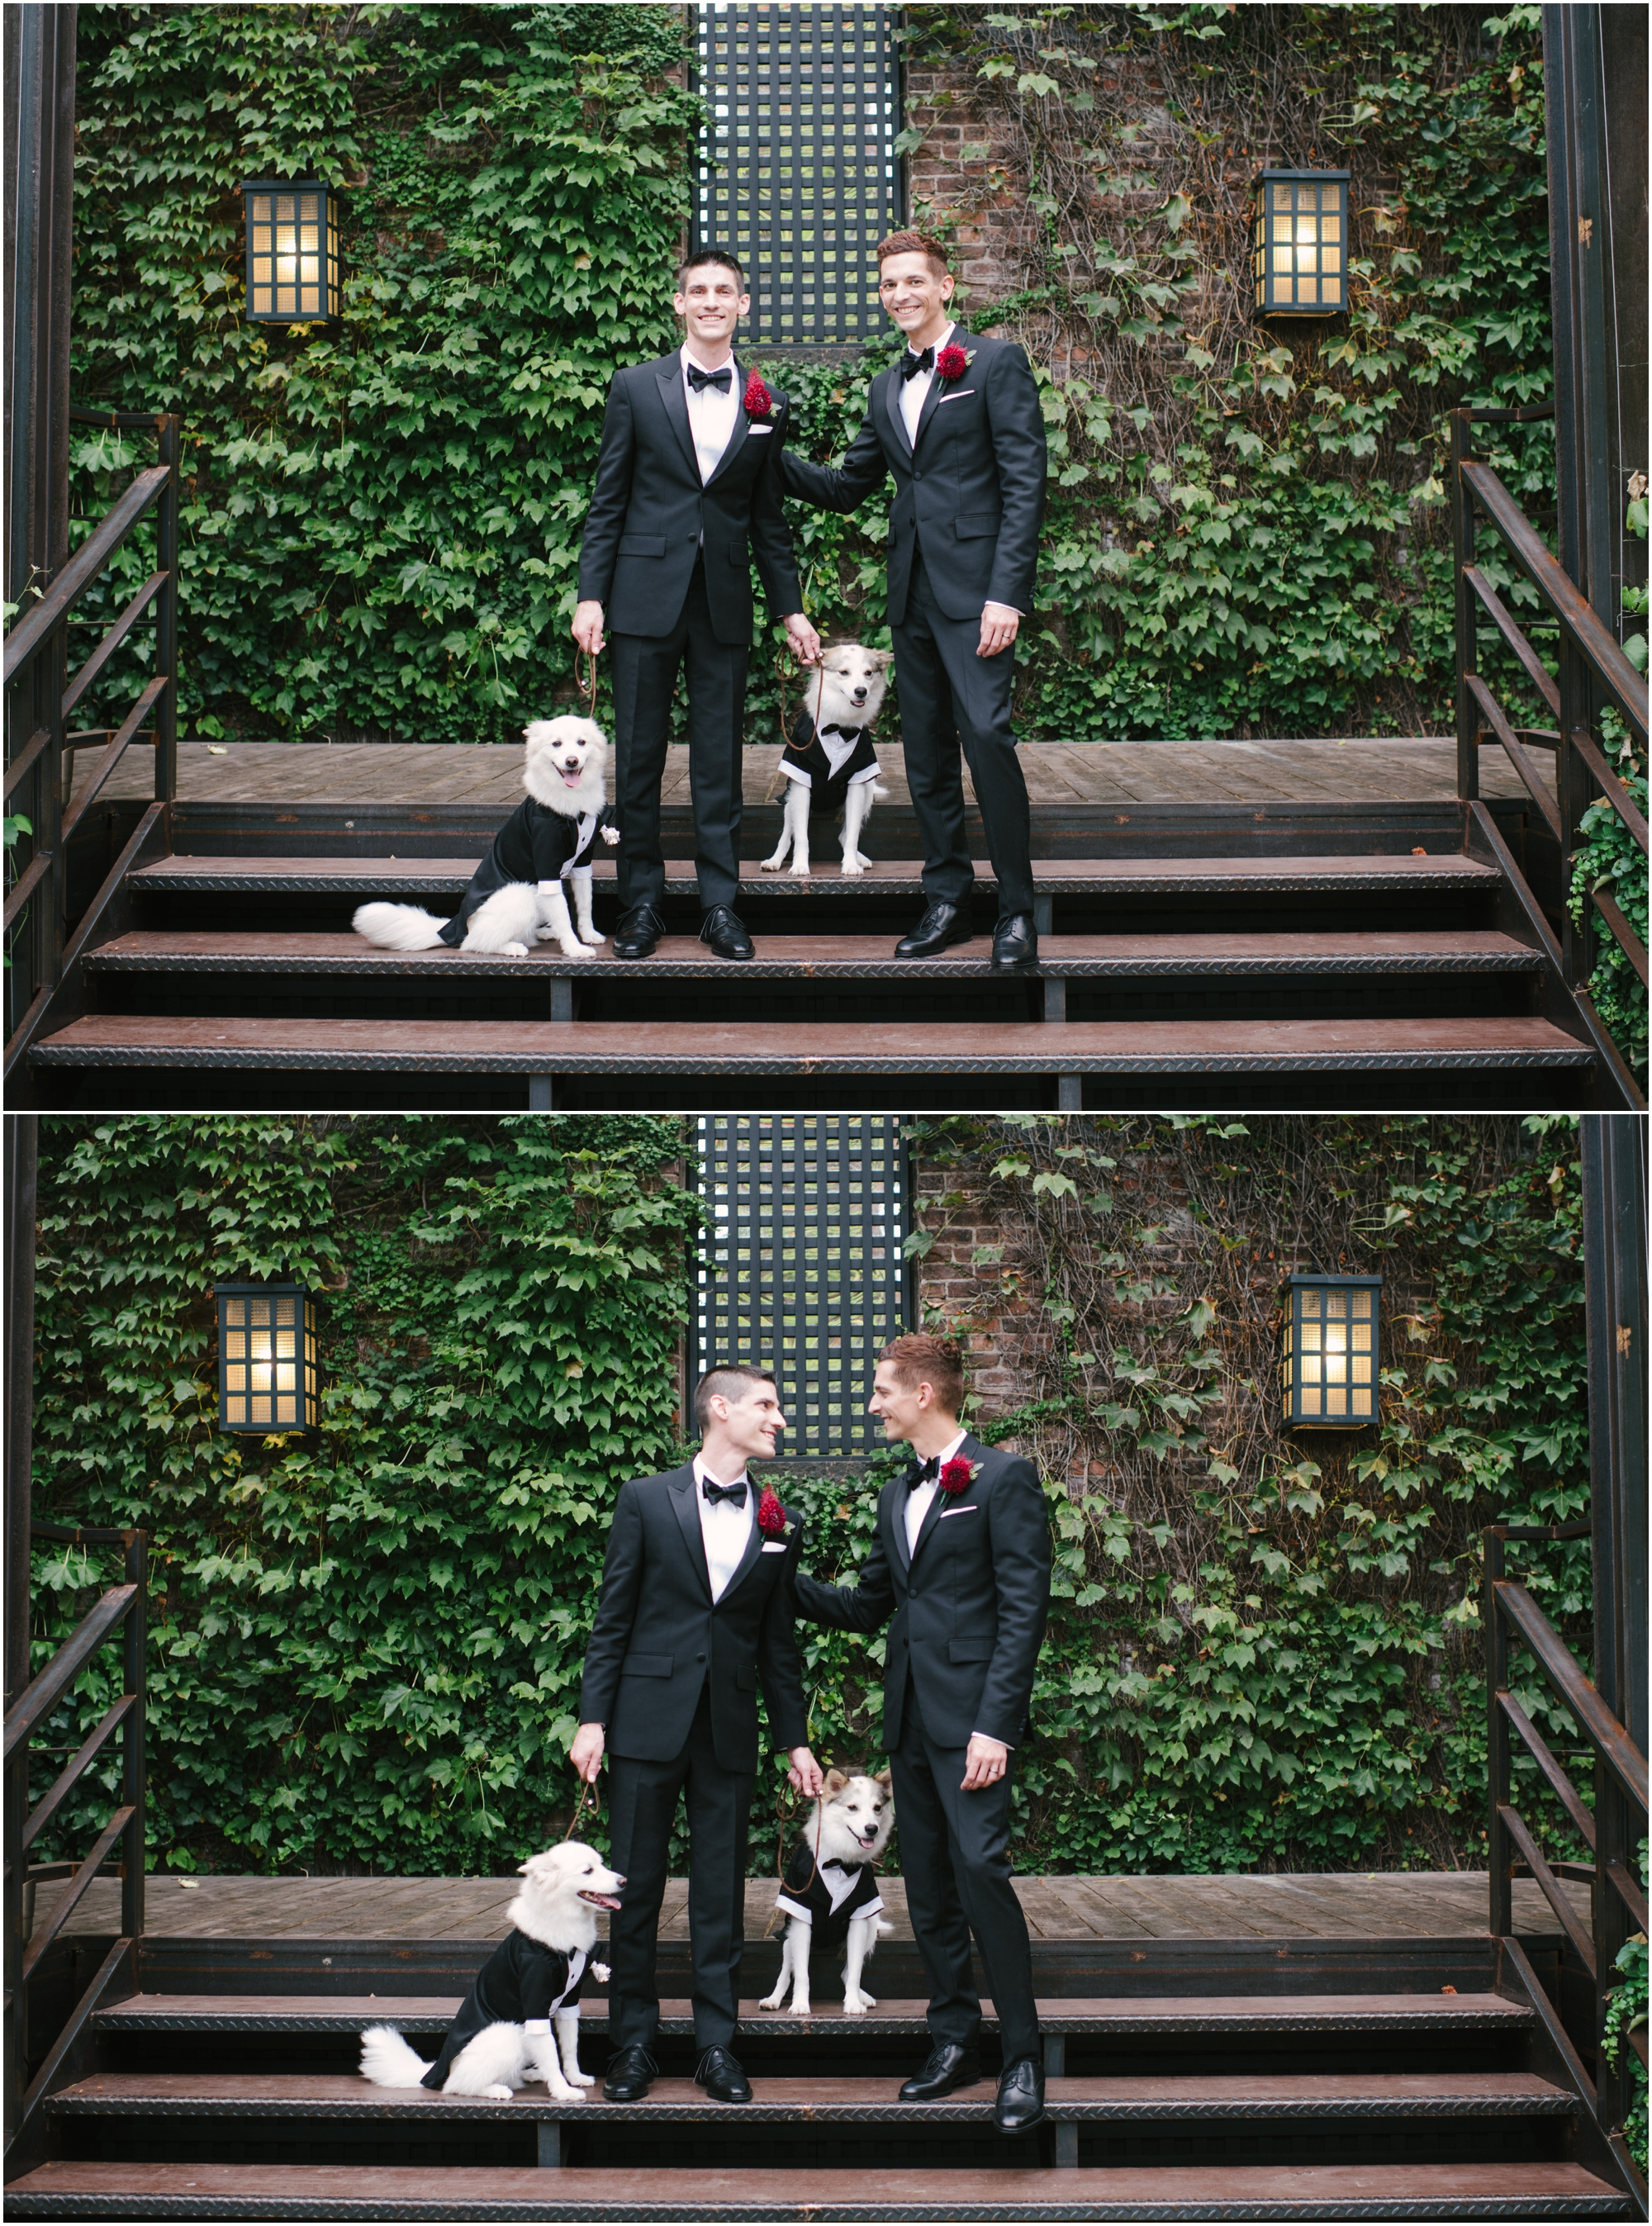 gay-wedding-photographer-williamsburgphotostudios-thefoundry-wedding-photographer_0014.jpg